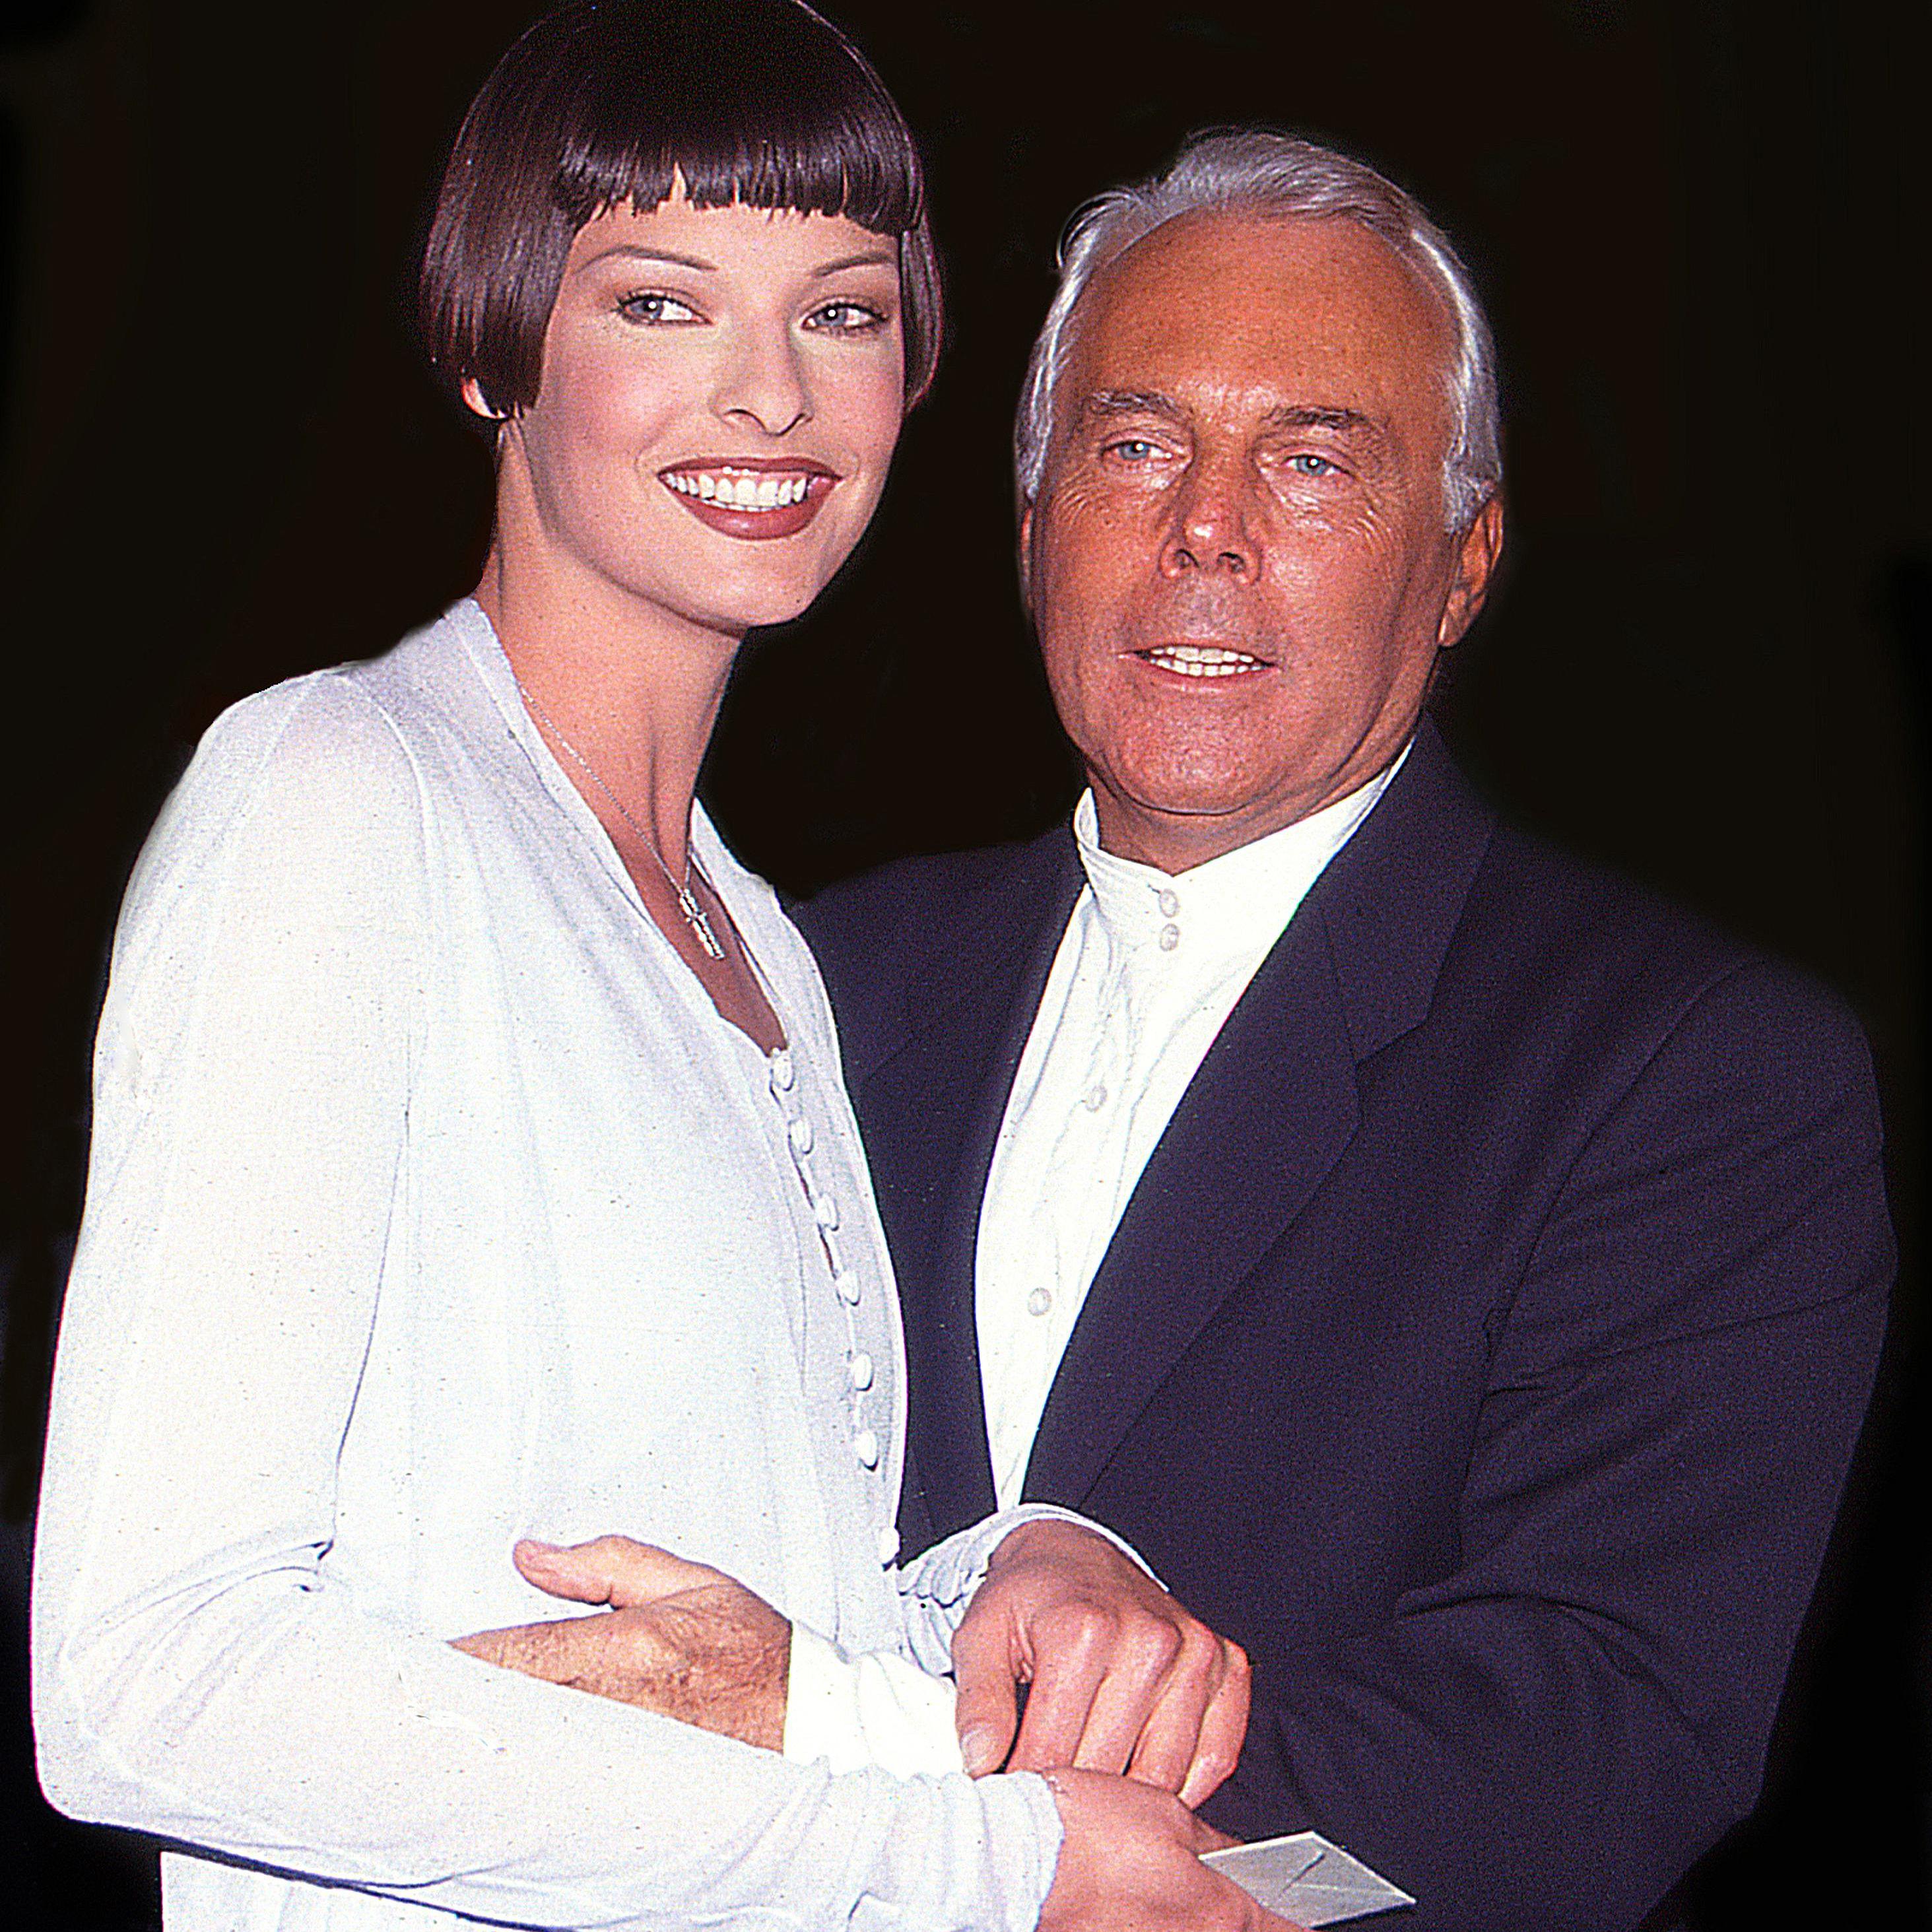 Linda Evangelista and Giorgio Armani at the Armani fashion party on West 57th street, New York, New York, 1997.